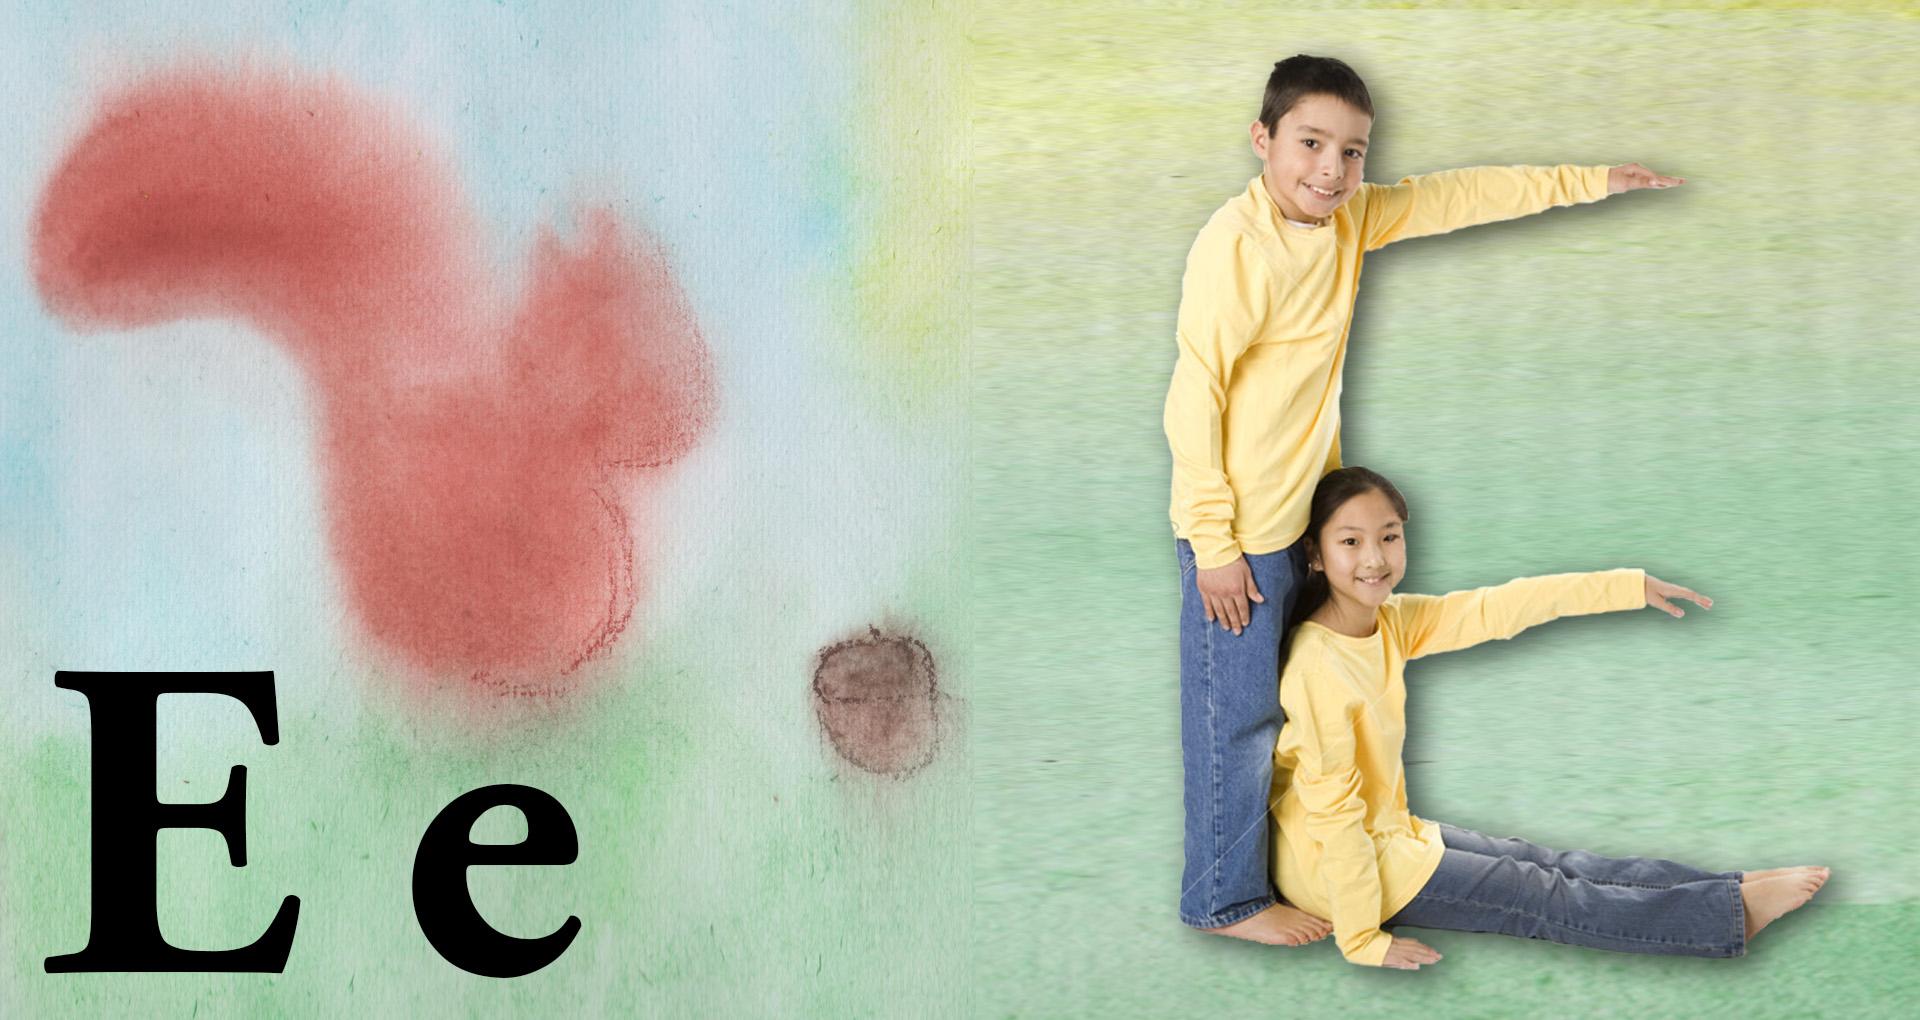 Diverse Childrens Font E Yellow